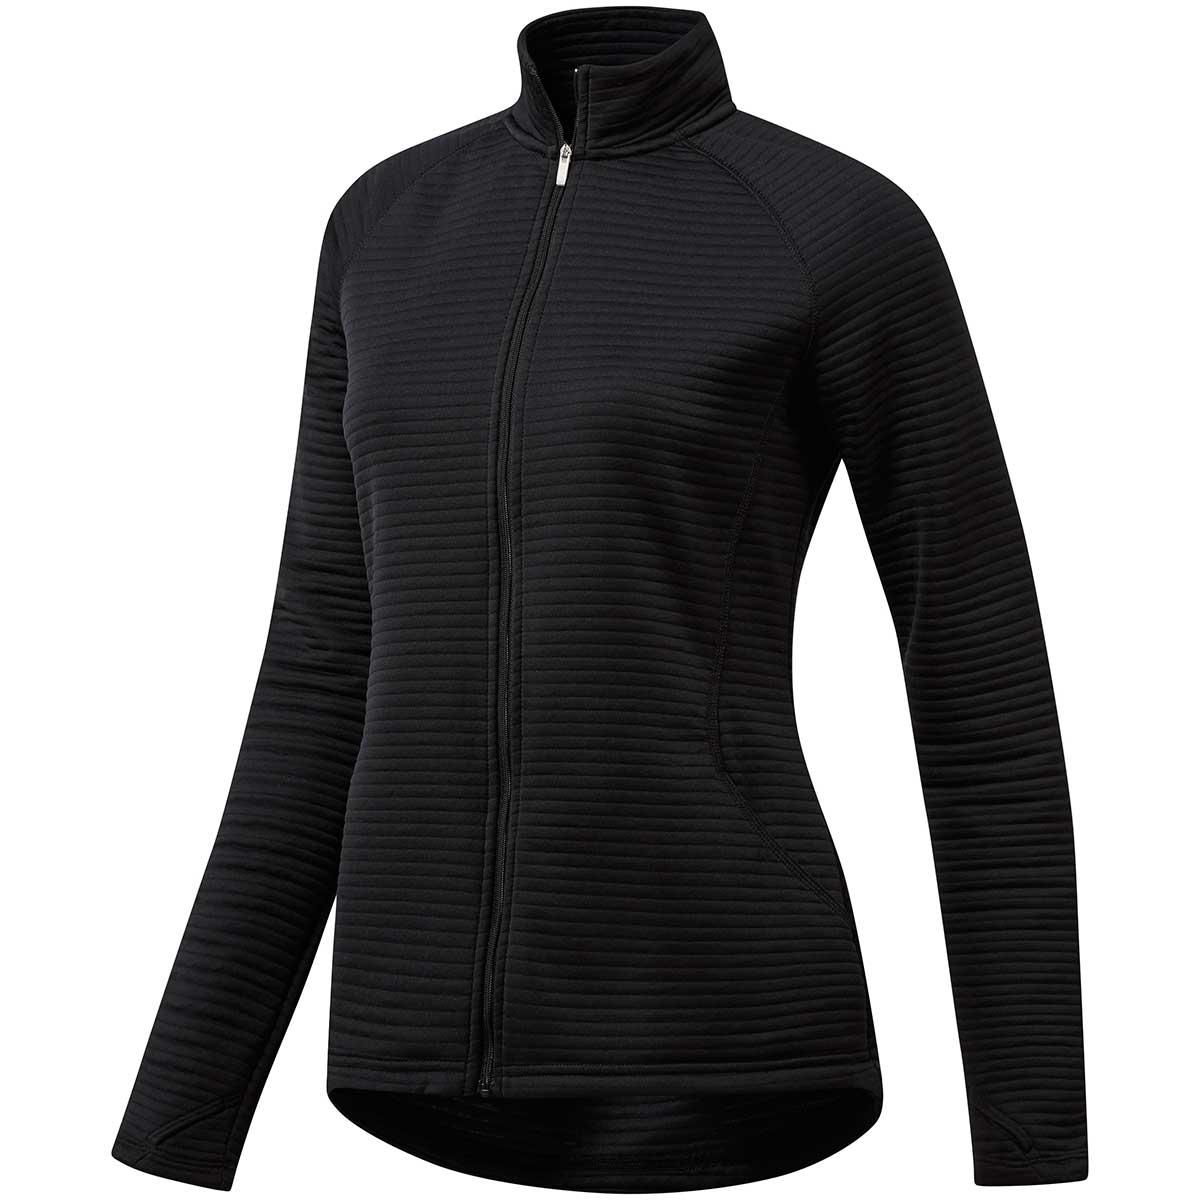 Adidas Women's Essential Text Full Zip Jacket - Black